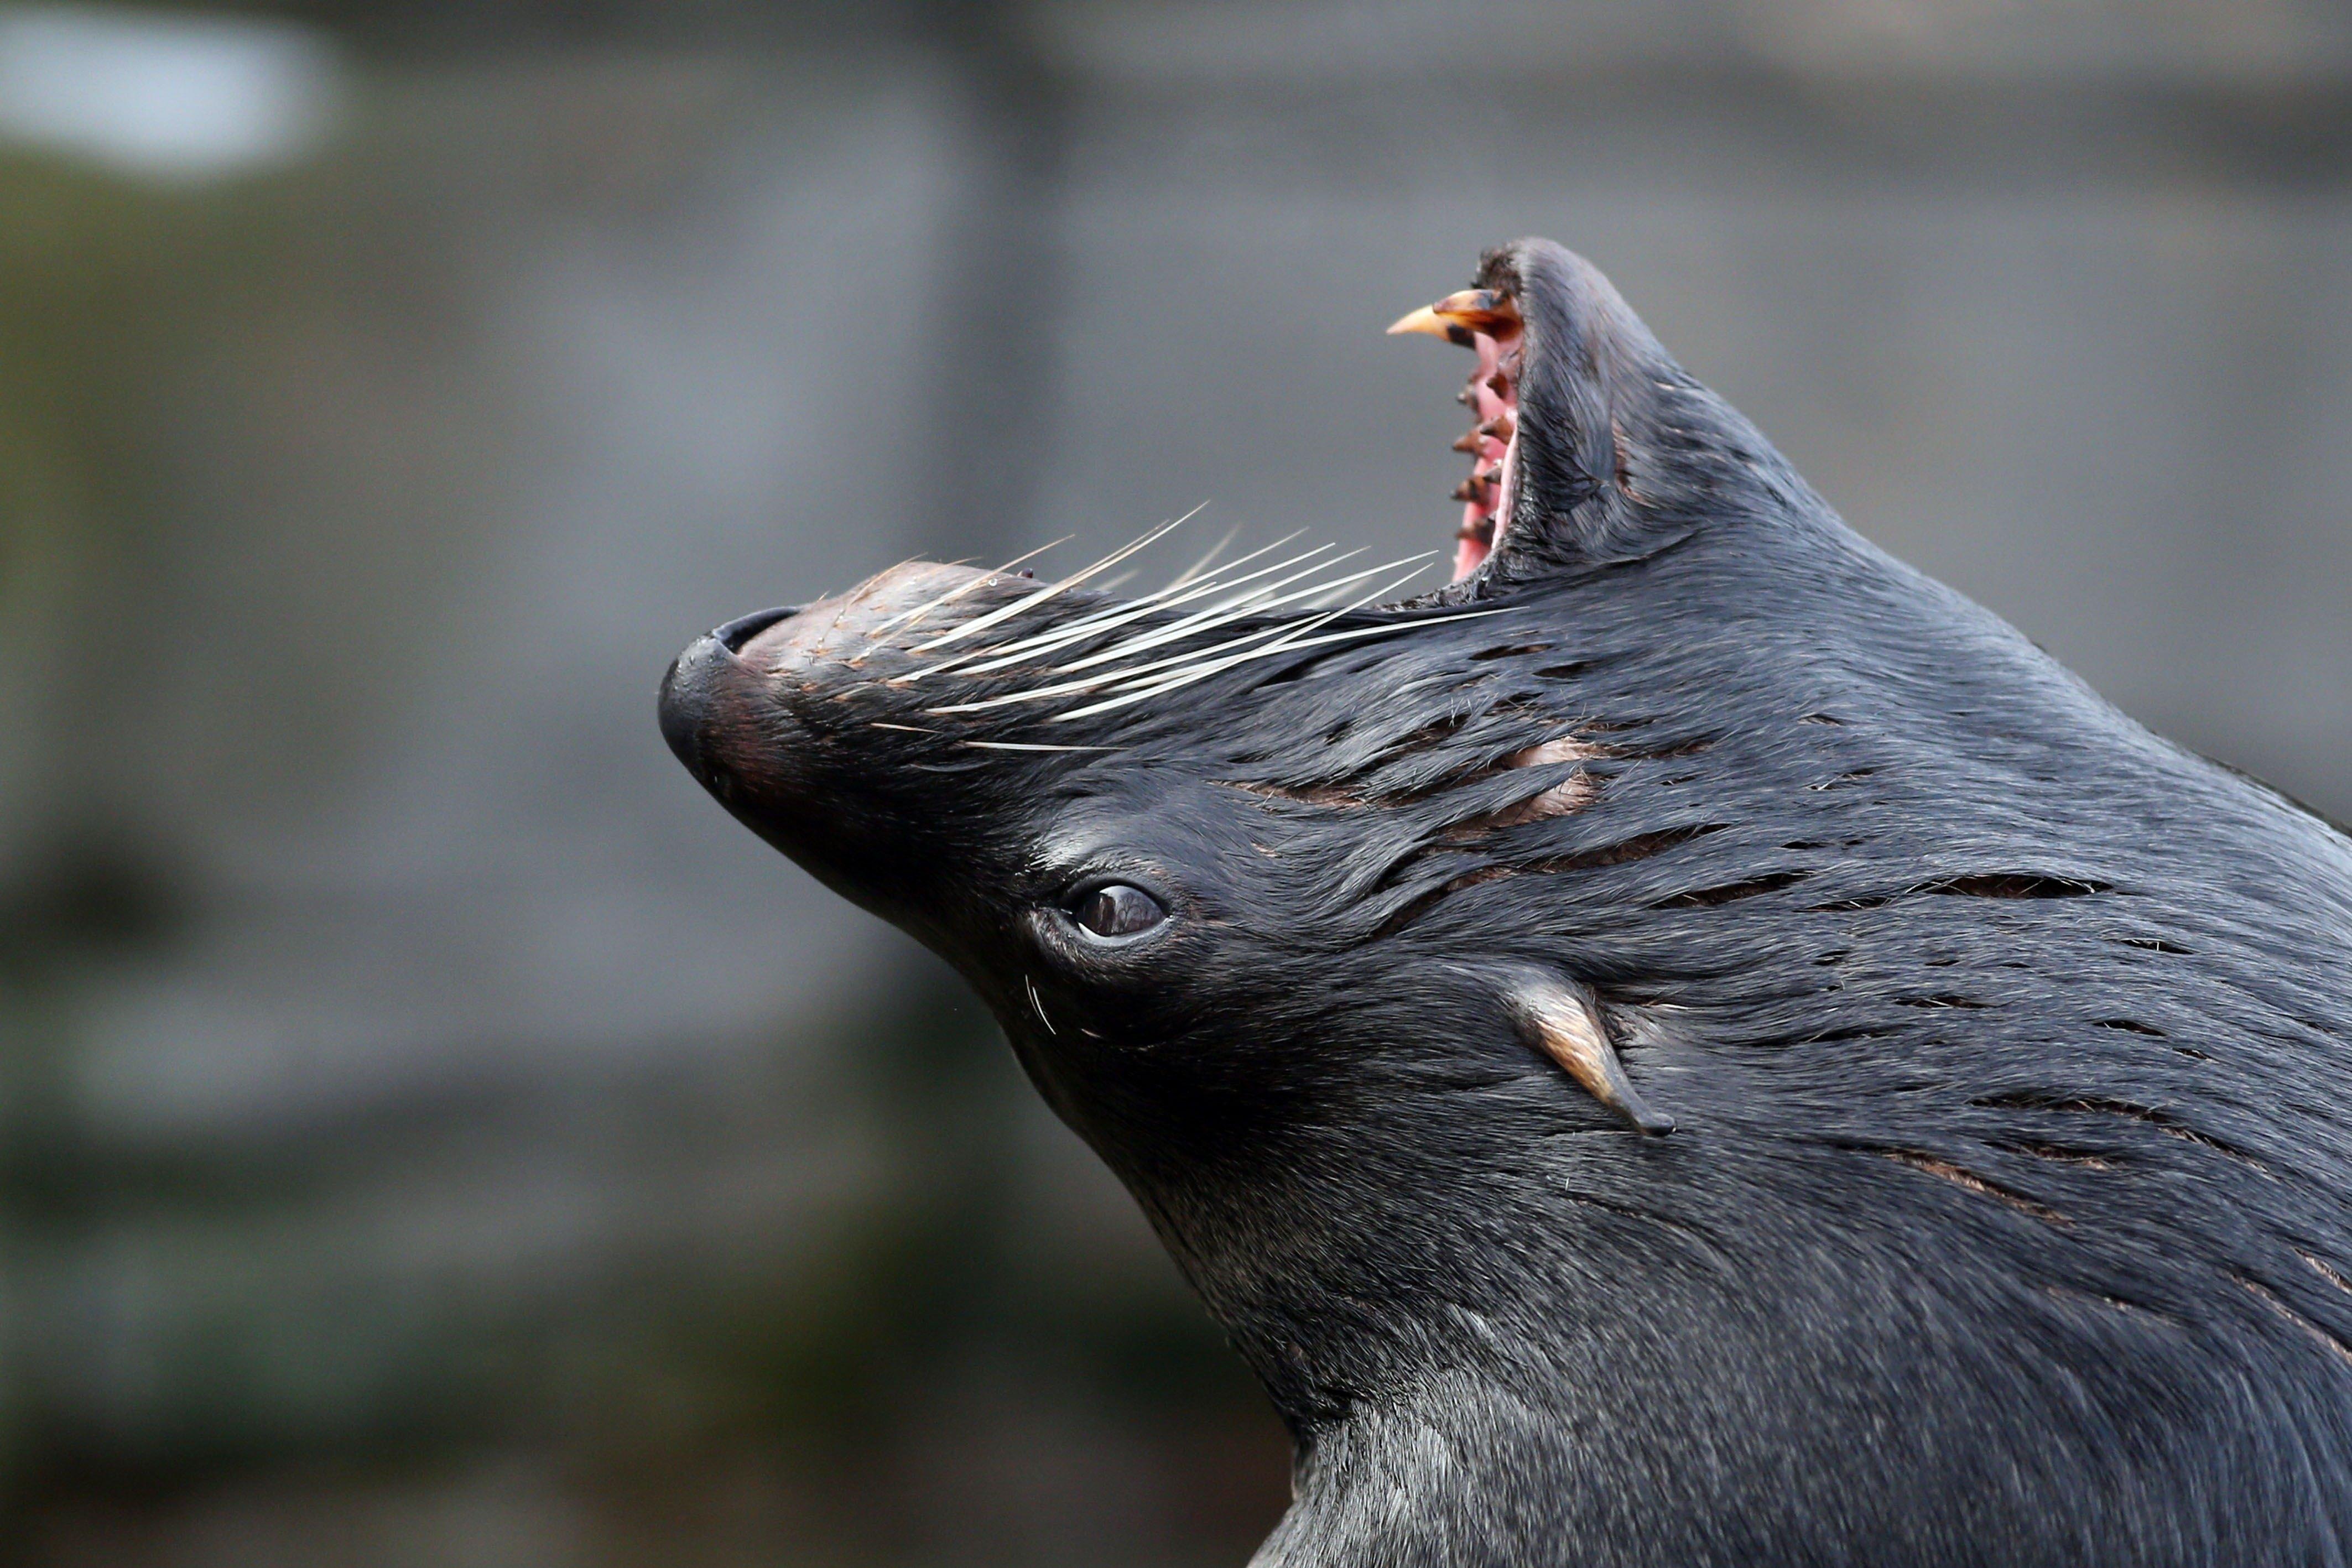 Sea lion's sneak 'attack' filmed by diver | 9Pickle